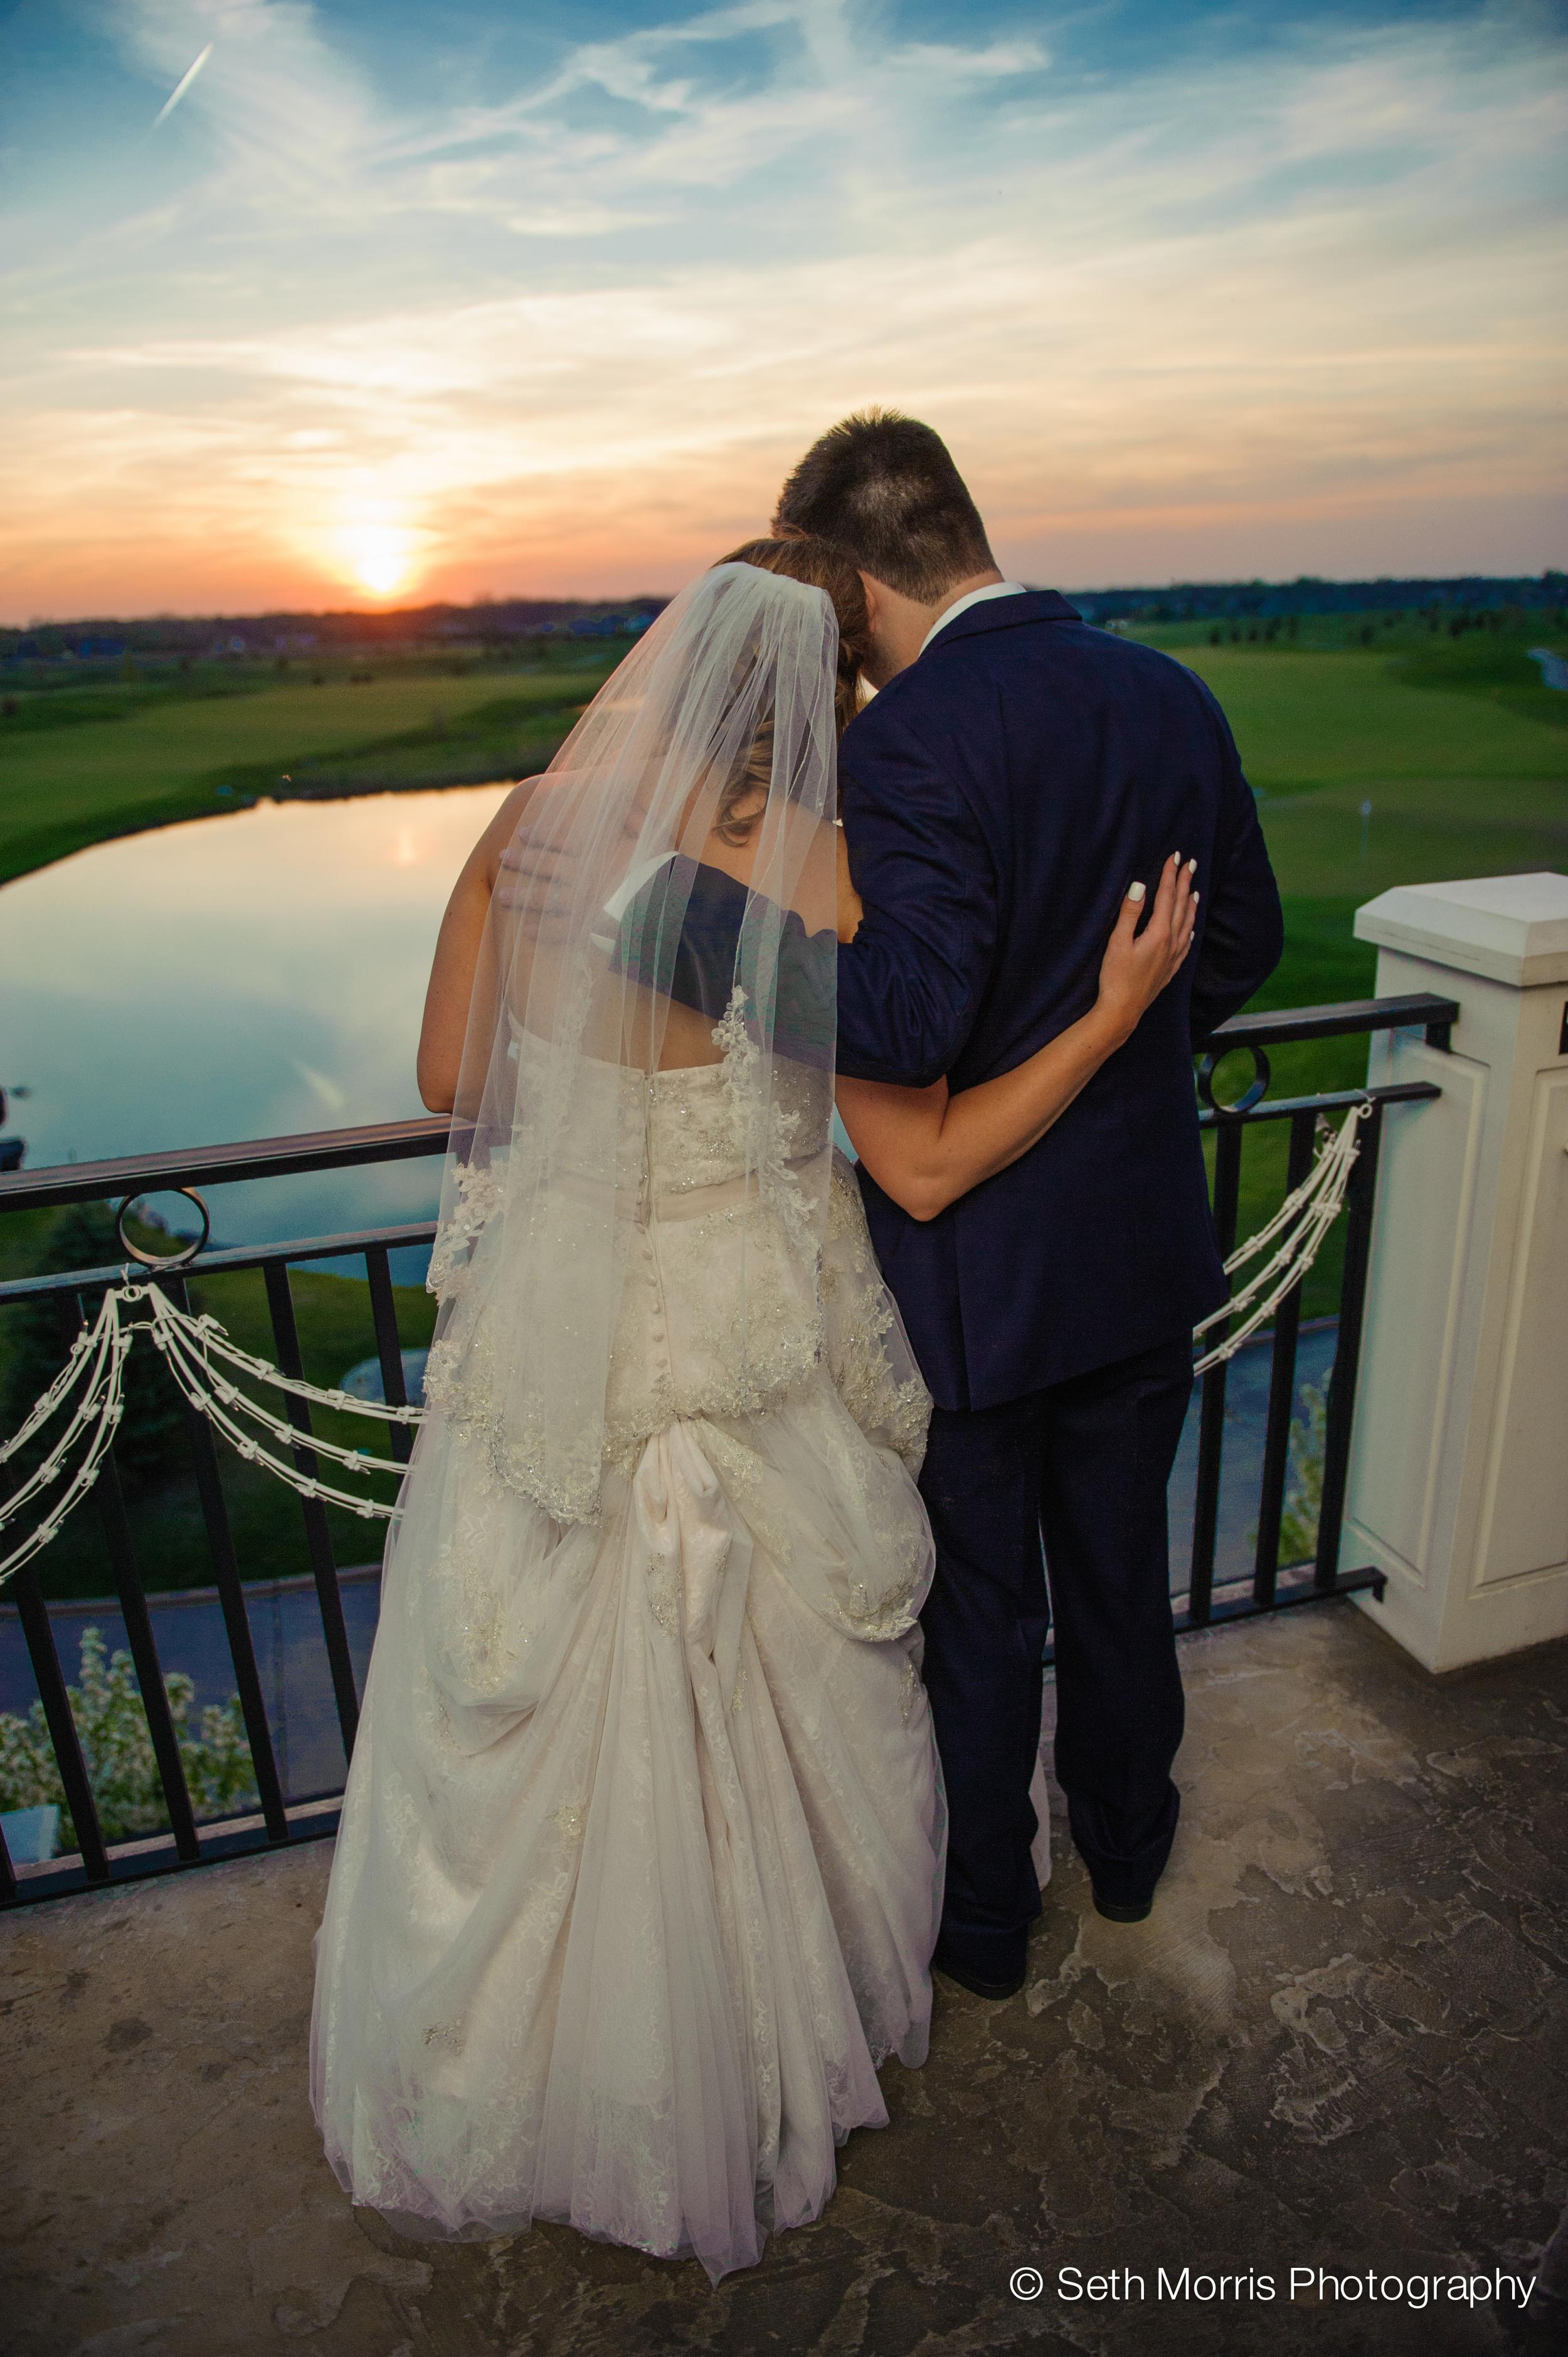 metamora-fields-wedding-photographer-peoria-185.jpg